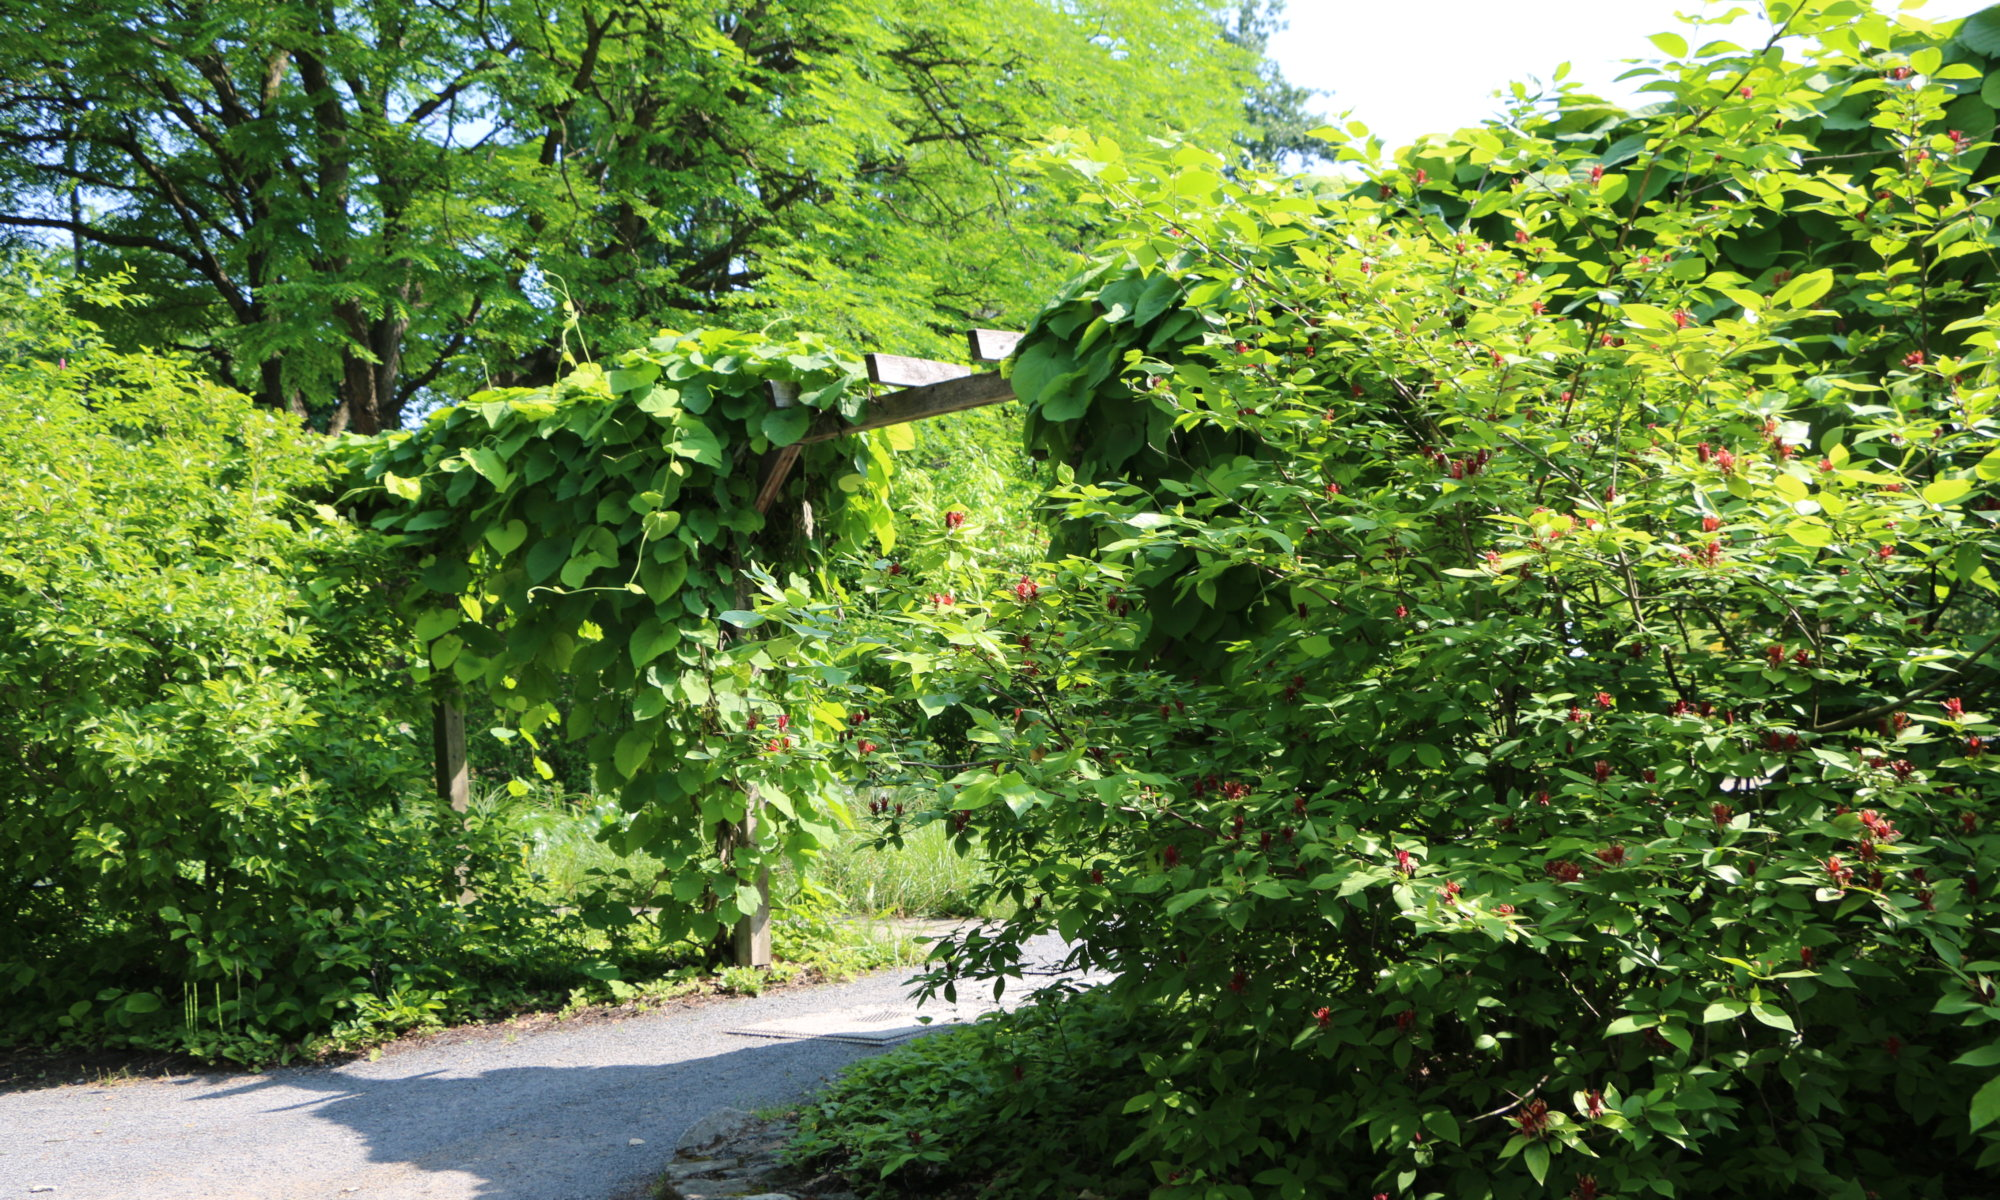 Alter Botanischer Garten, Göttingen